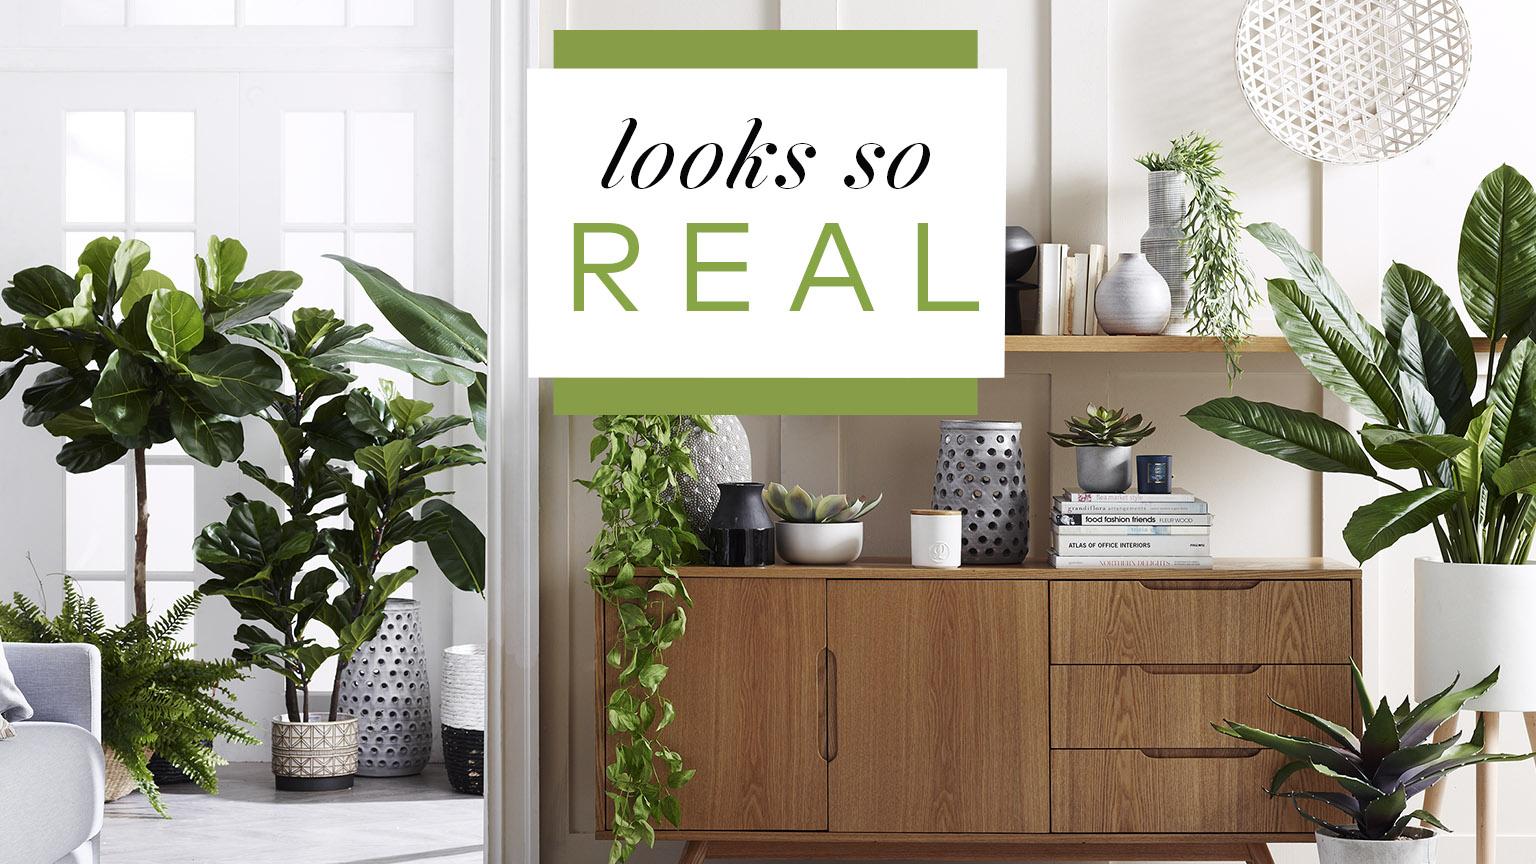 Greenery - Looks so real